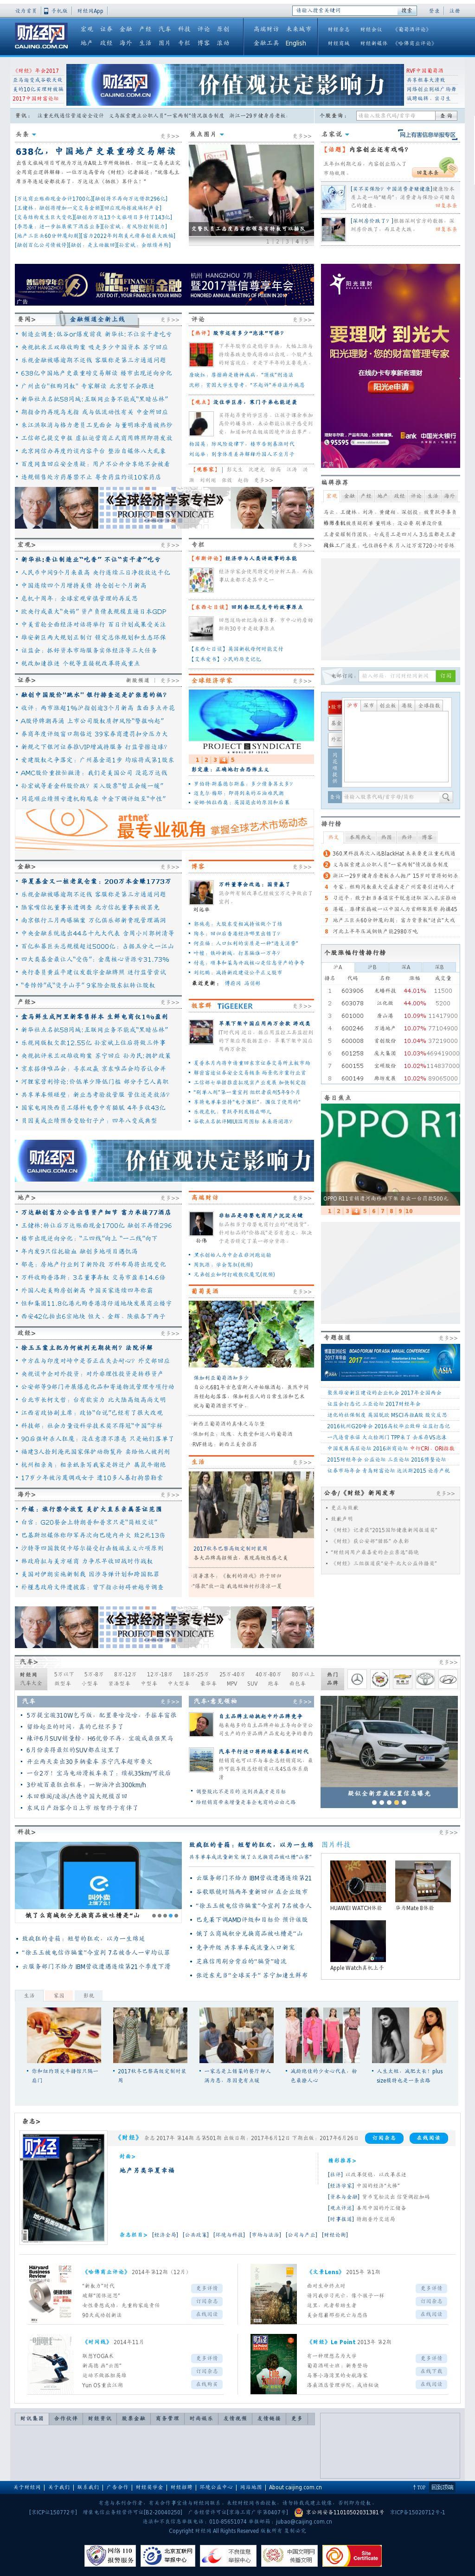 Caijing at Wednesday July 19, 2017, 6:01 p.m. UTC